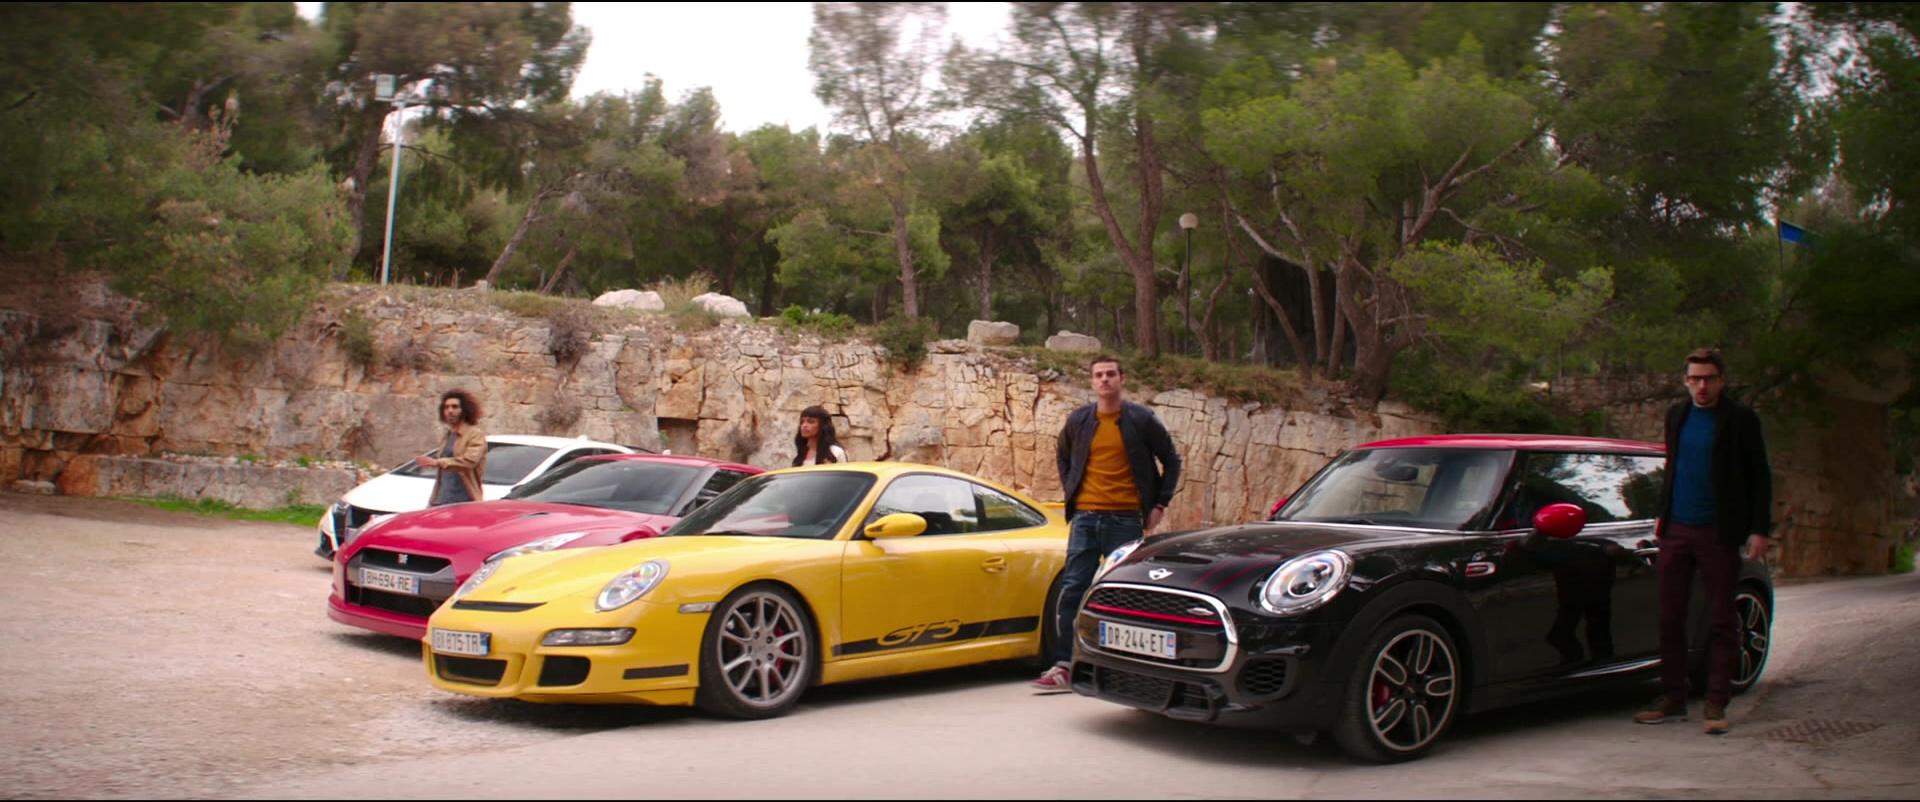 Porsche 911 Gt3 997 Nissan Gt R Mini Cooper S Jcw And Honda